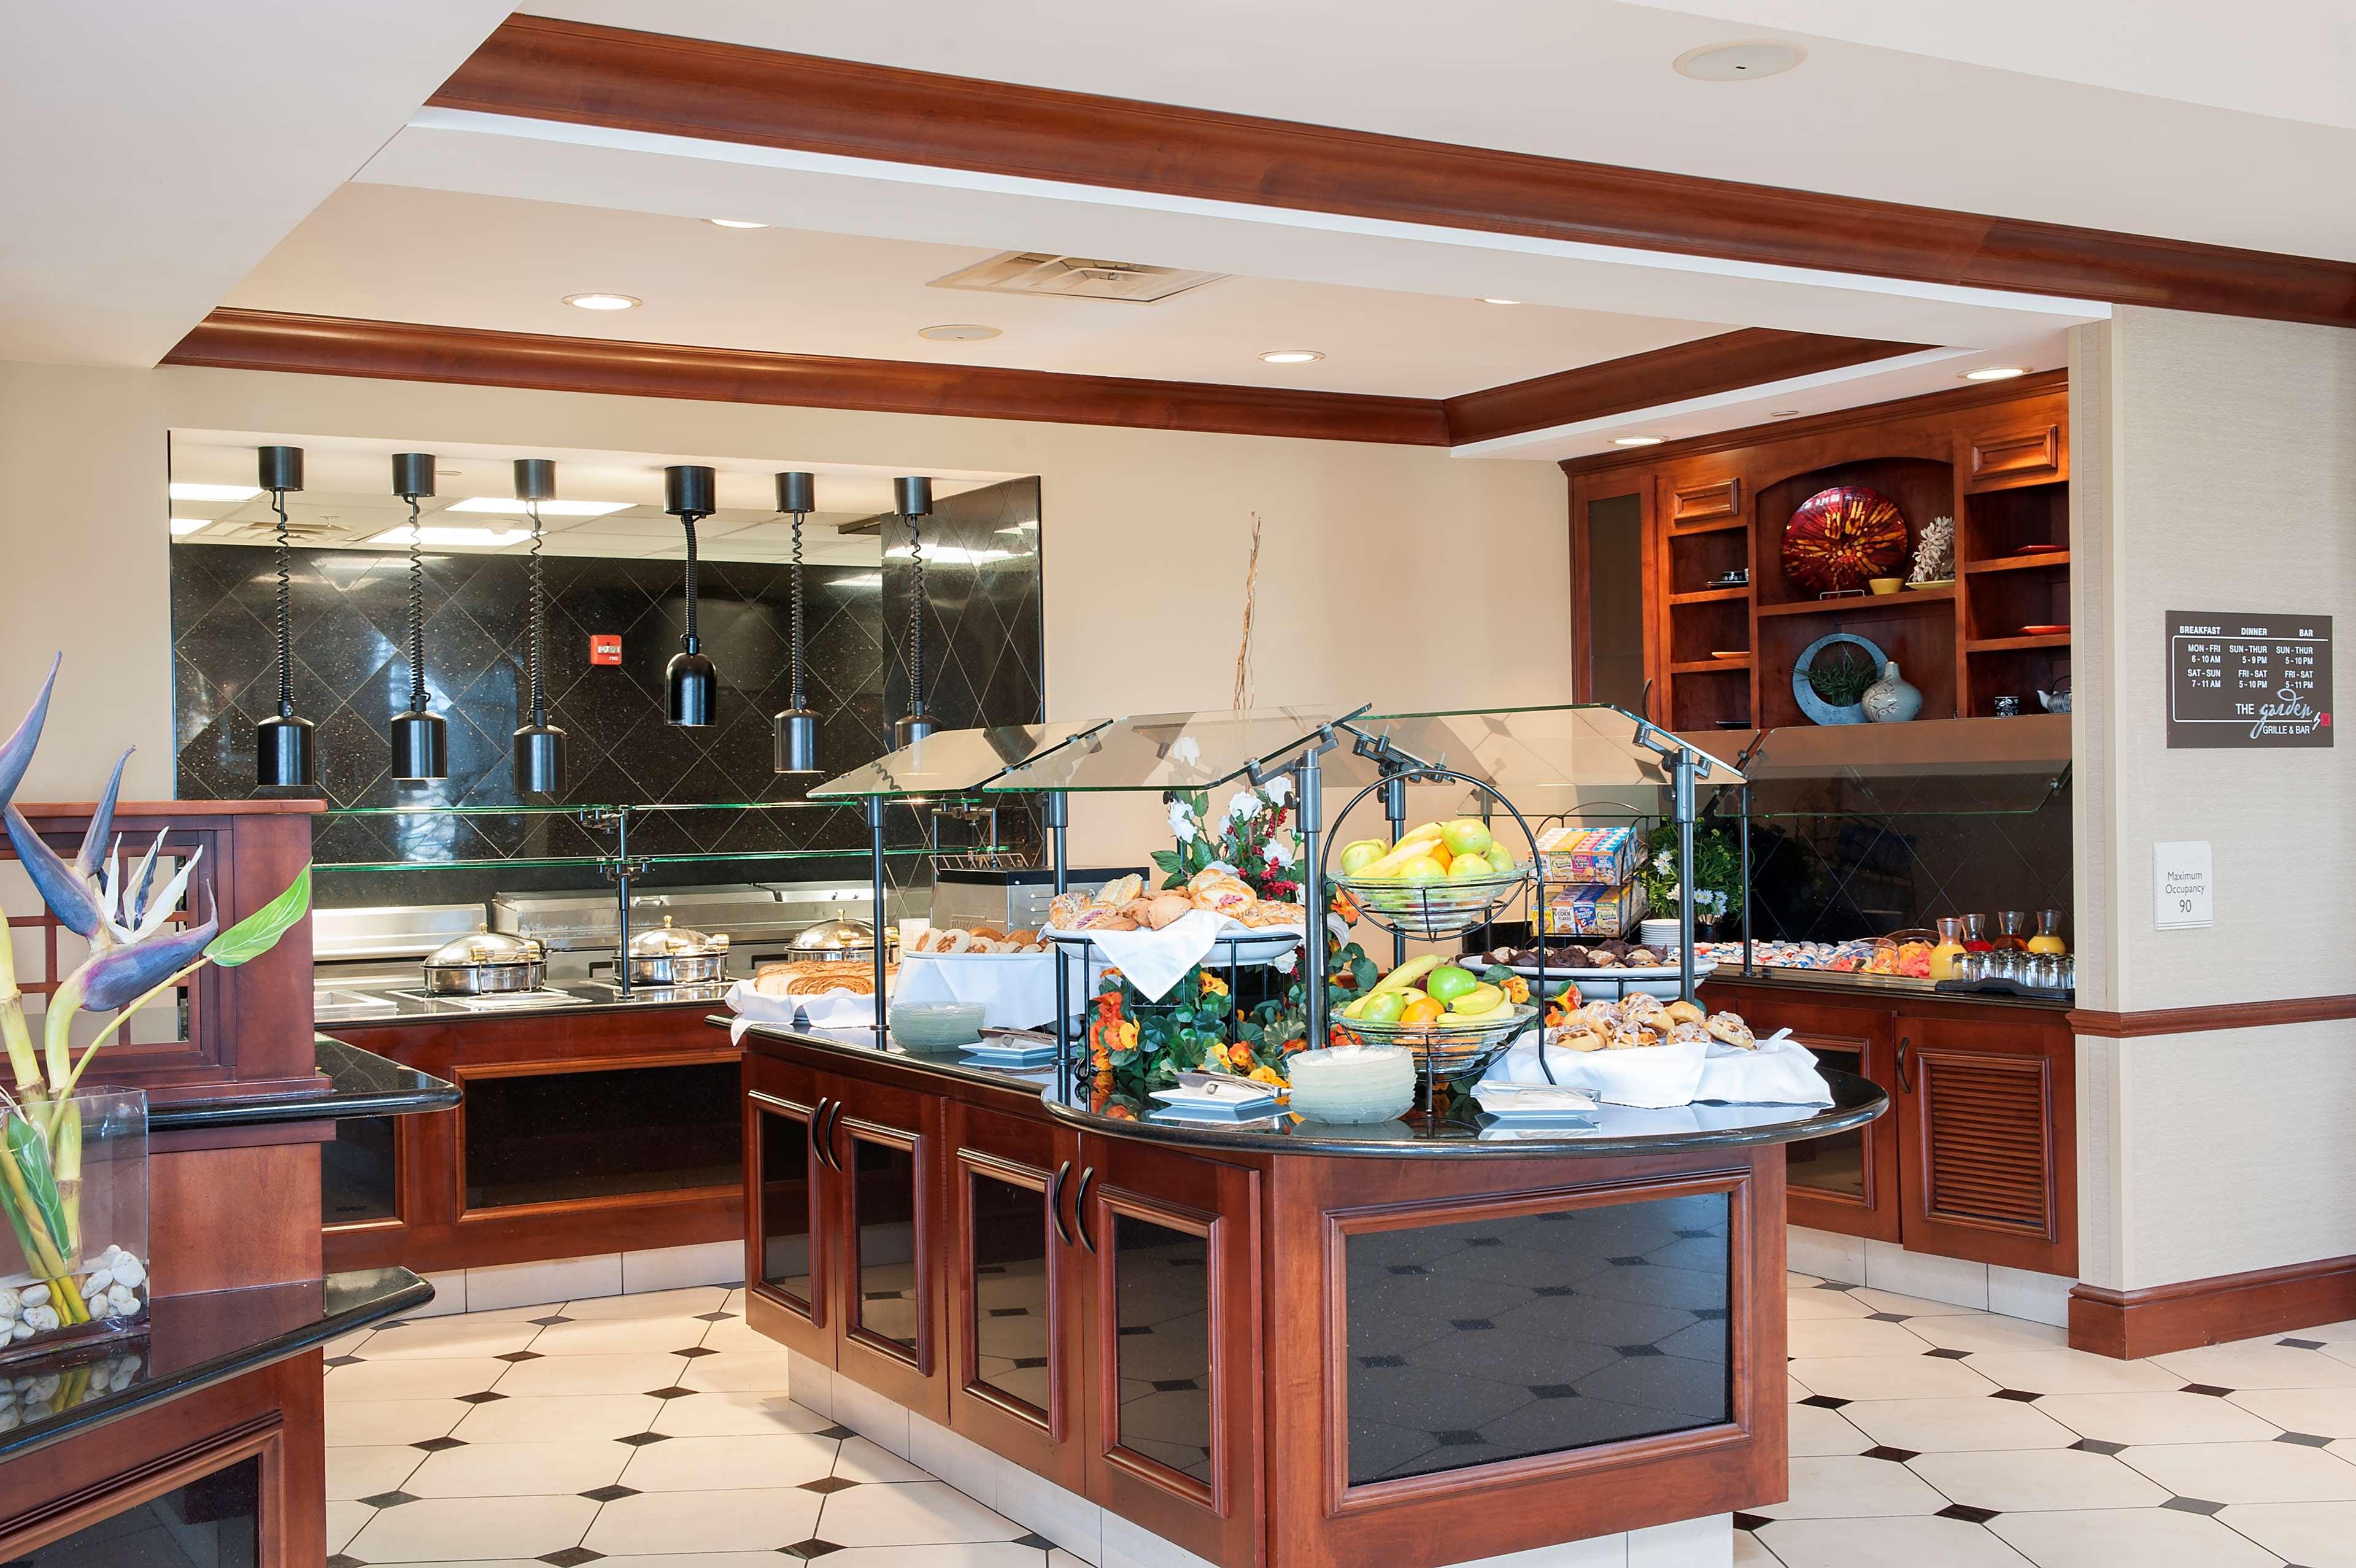 Hilton Garden Inn Indianapolis South/Greenwood image 9